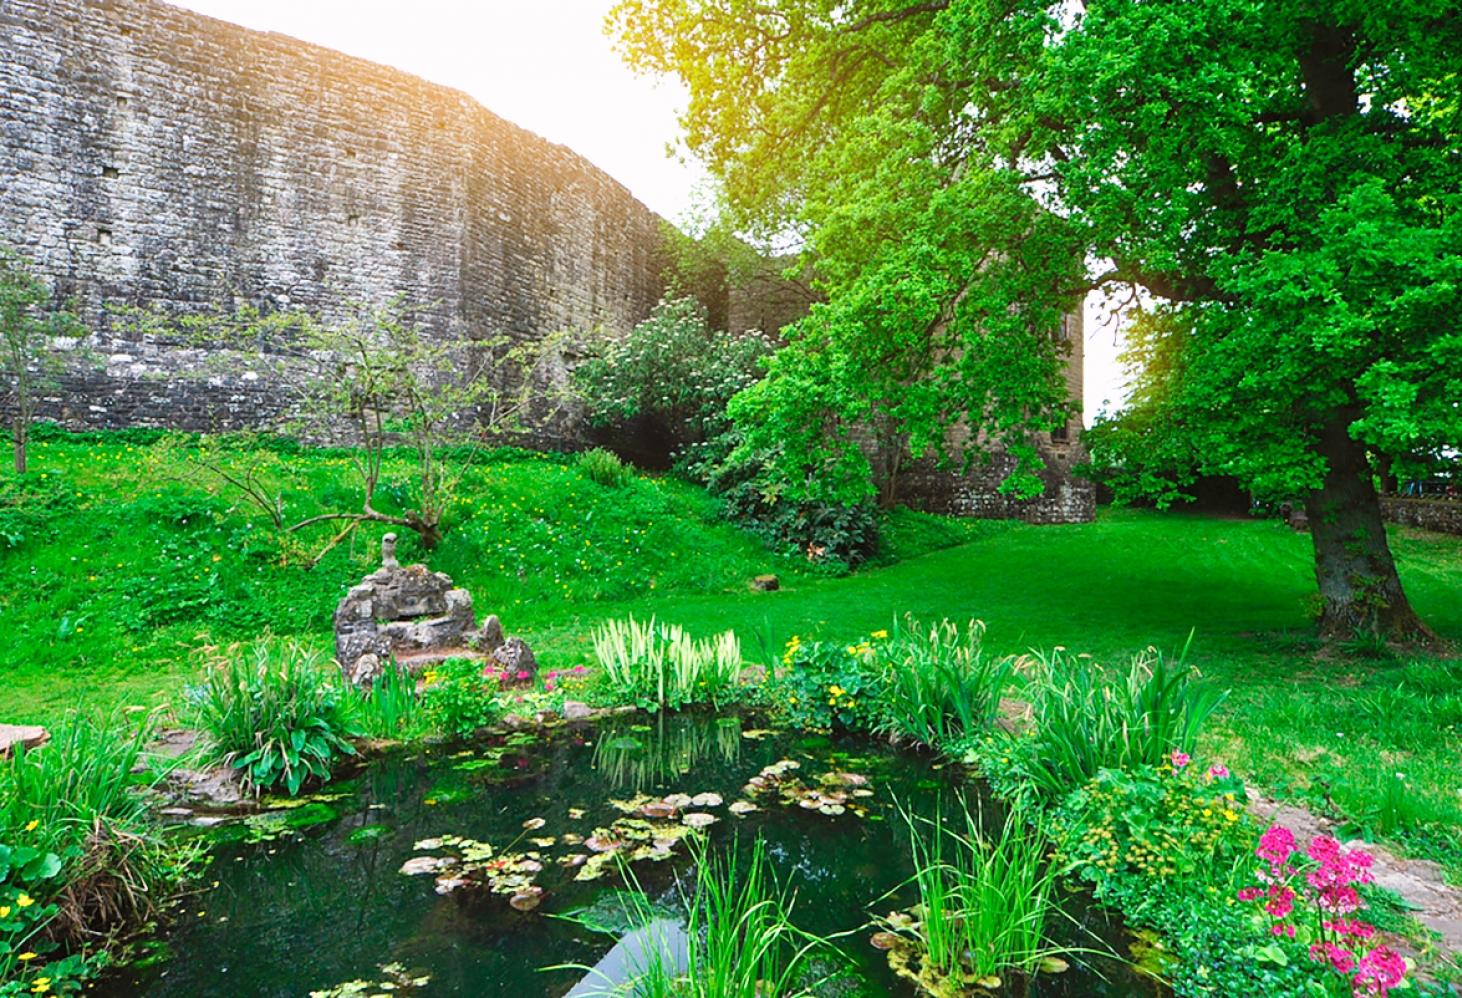 St Briavels Castle, Глостершир, Англия